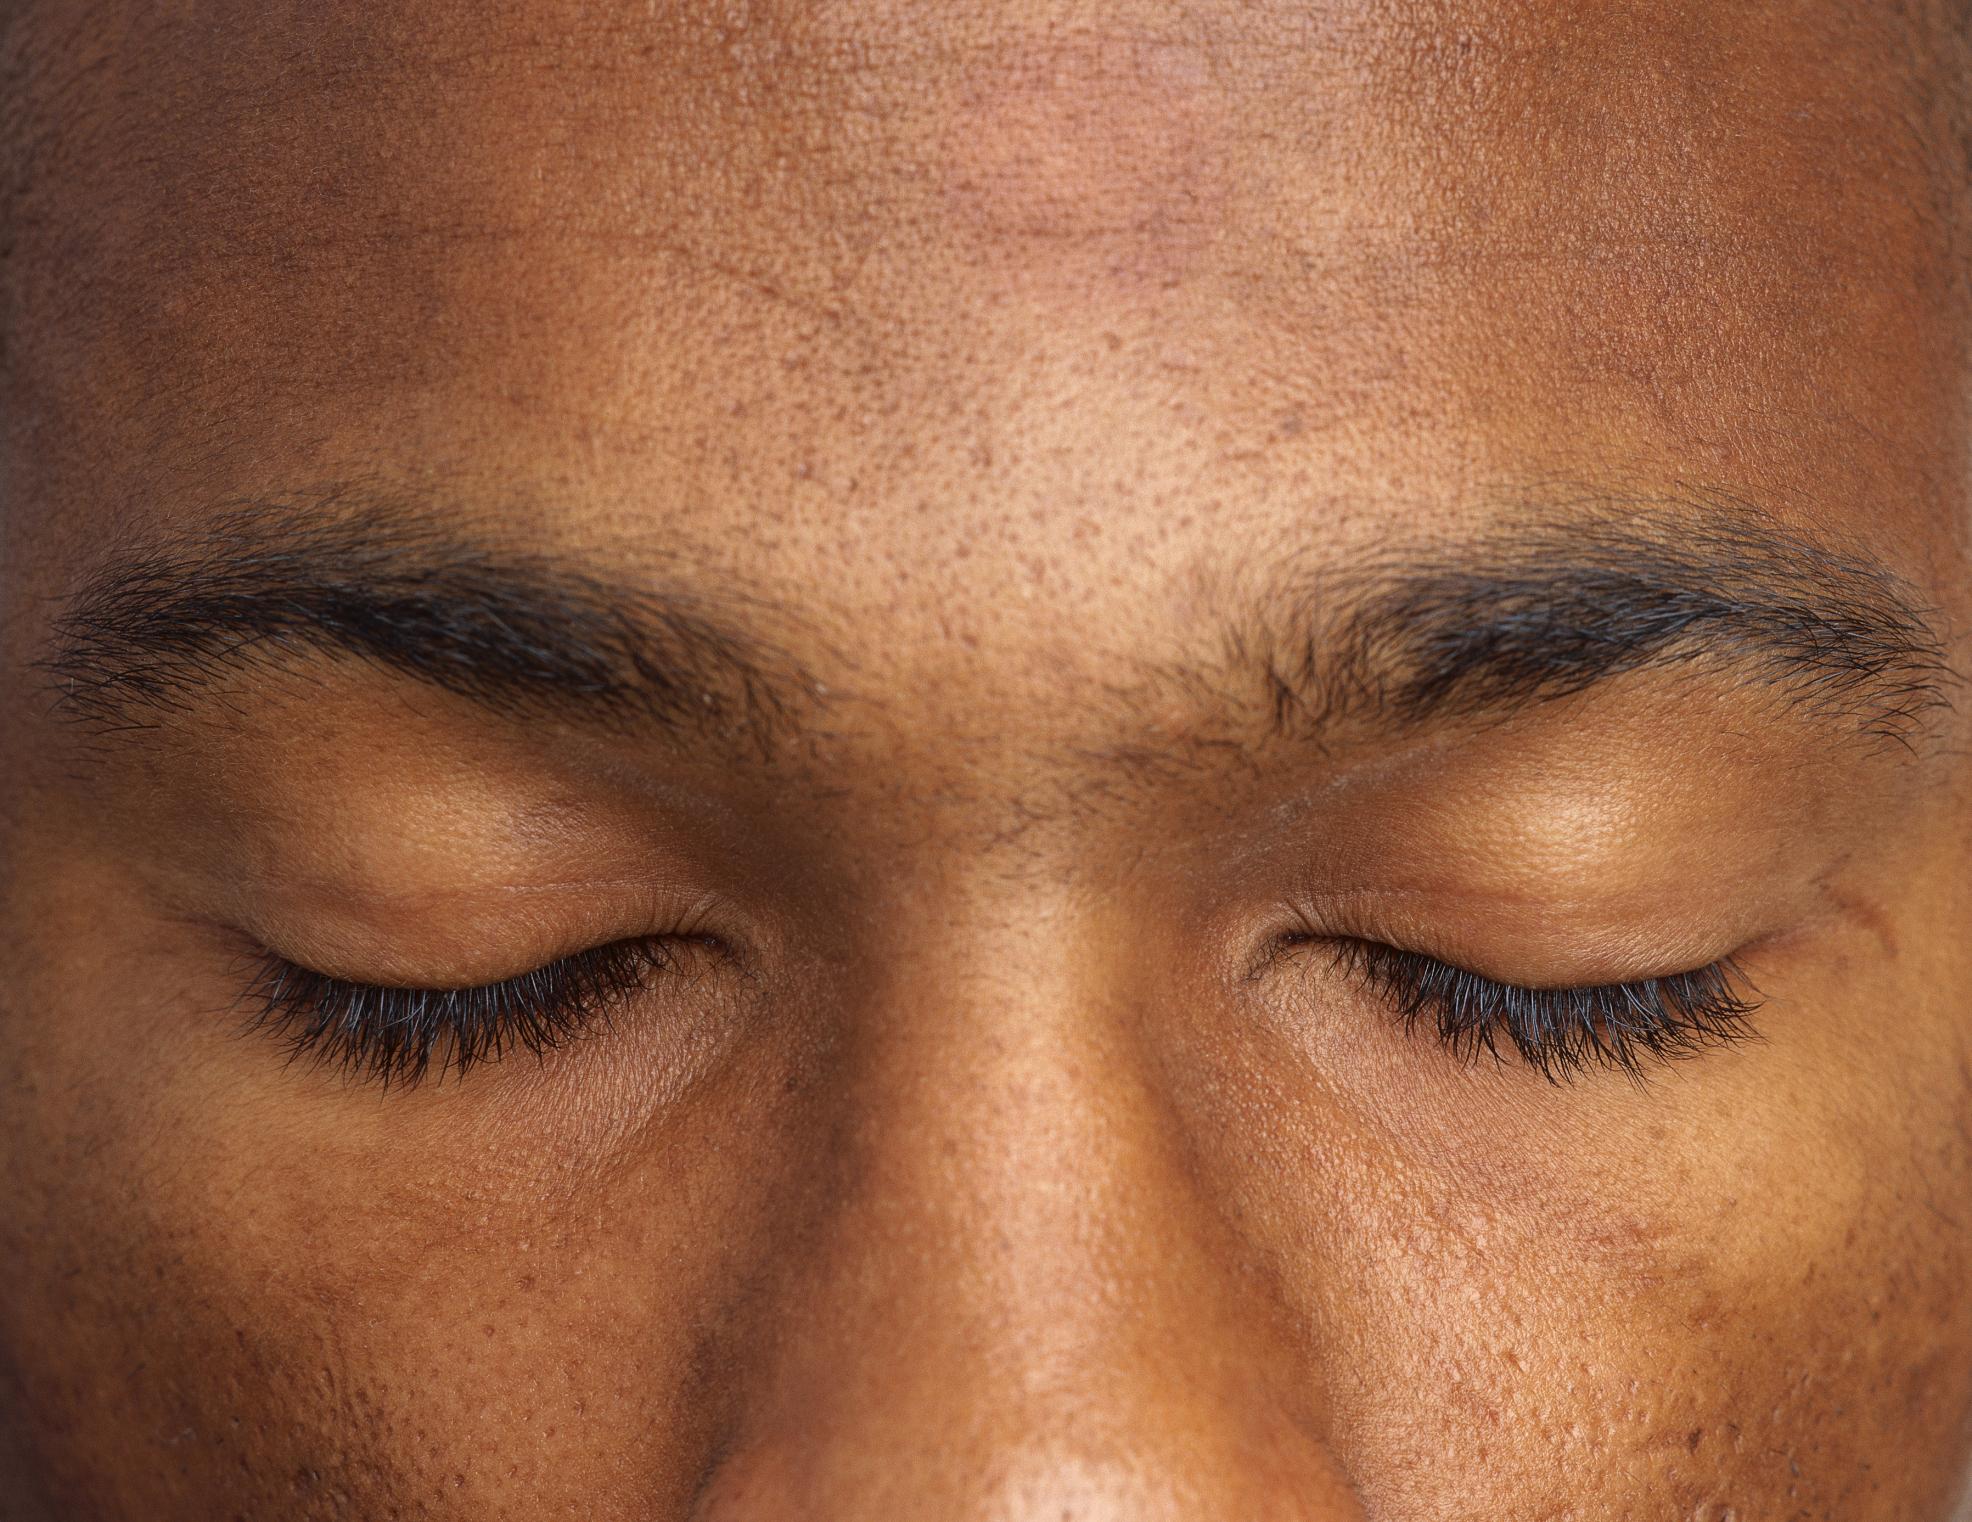 Eyebrow Hair Loss And Stress